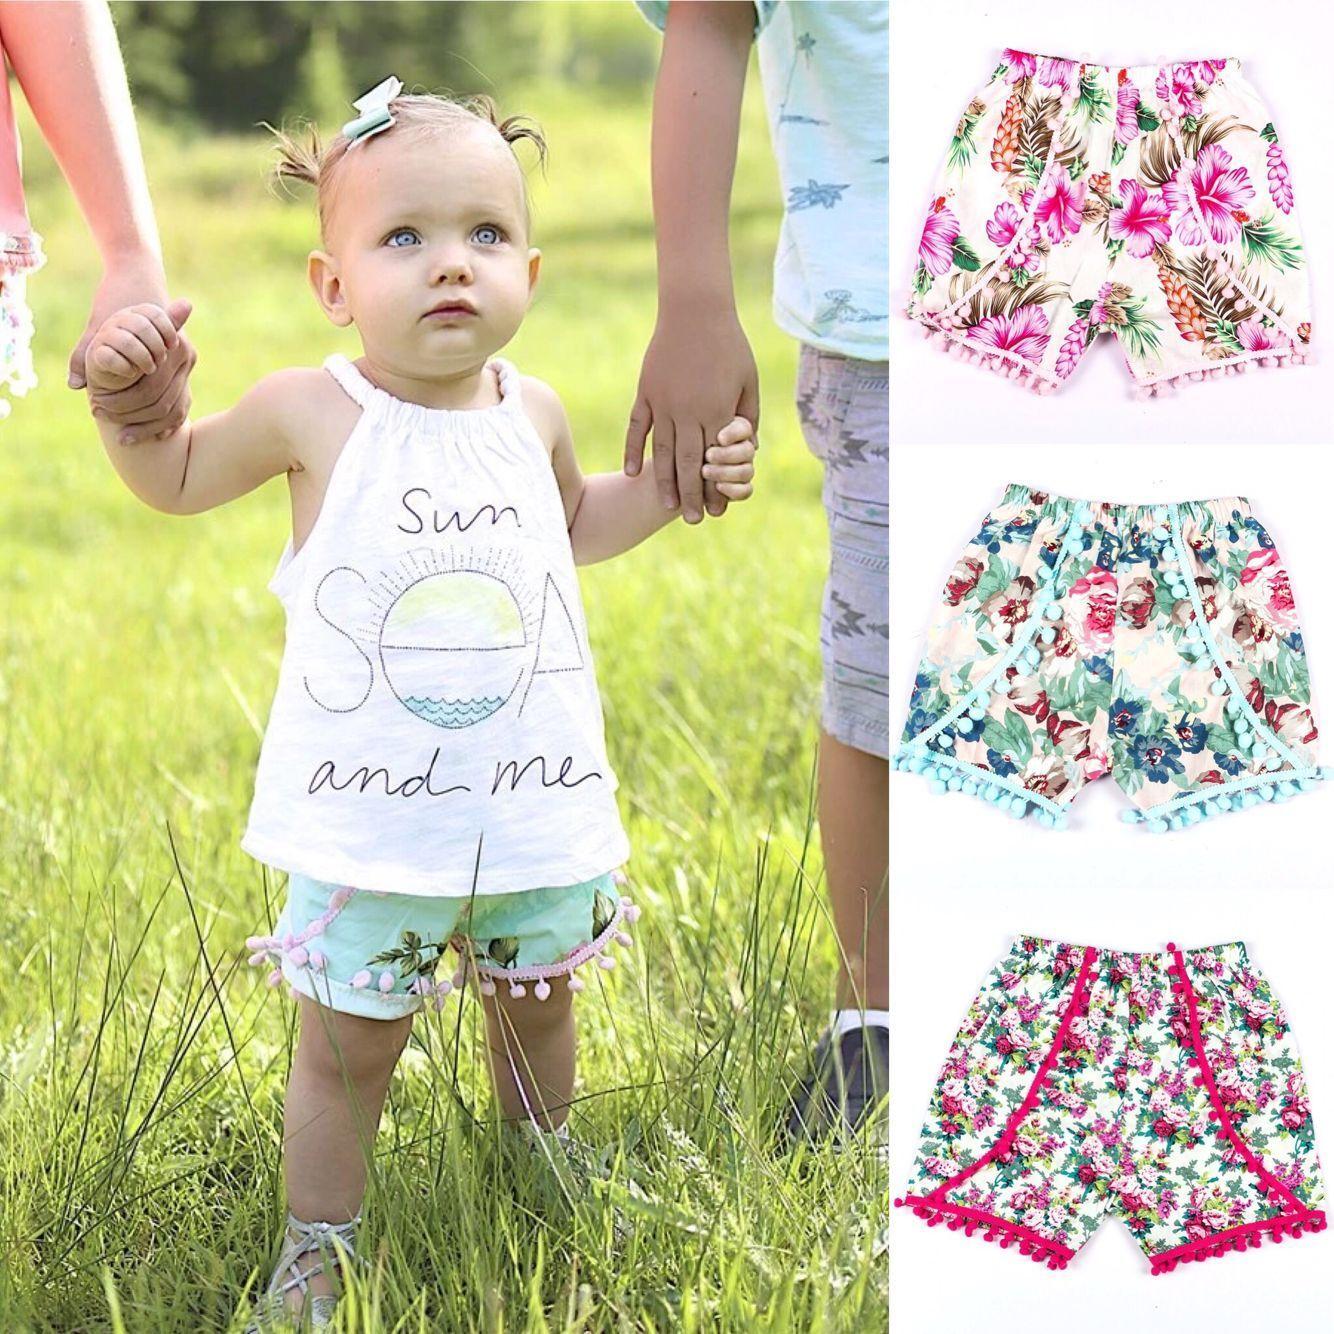 Summer 2017 Kids Pom Pom Shorts Toddler Tassel Floral Shorts Baby